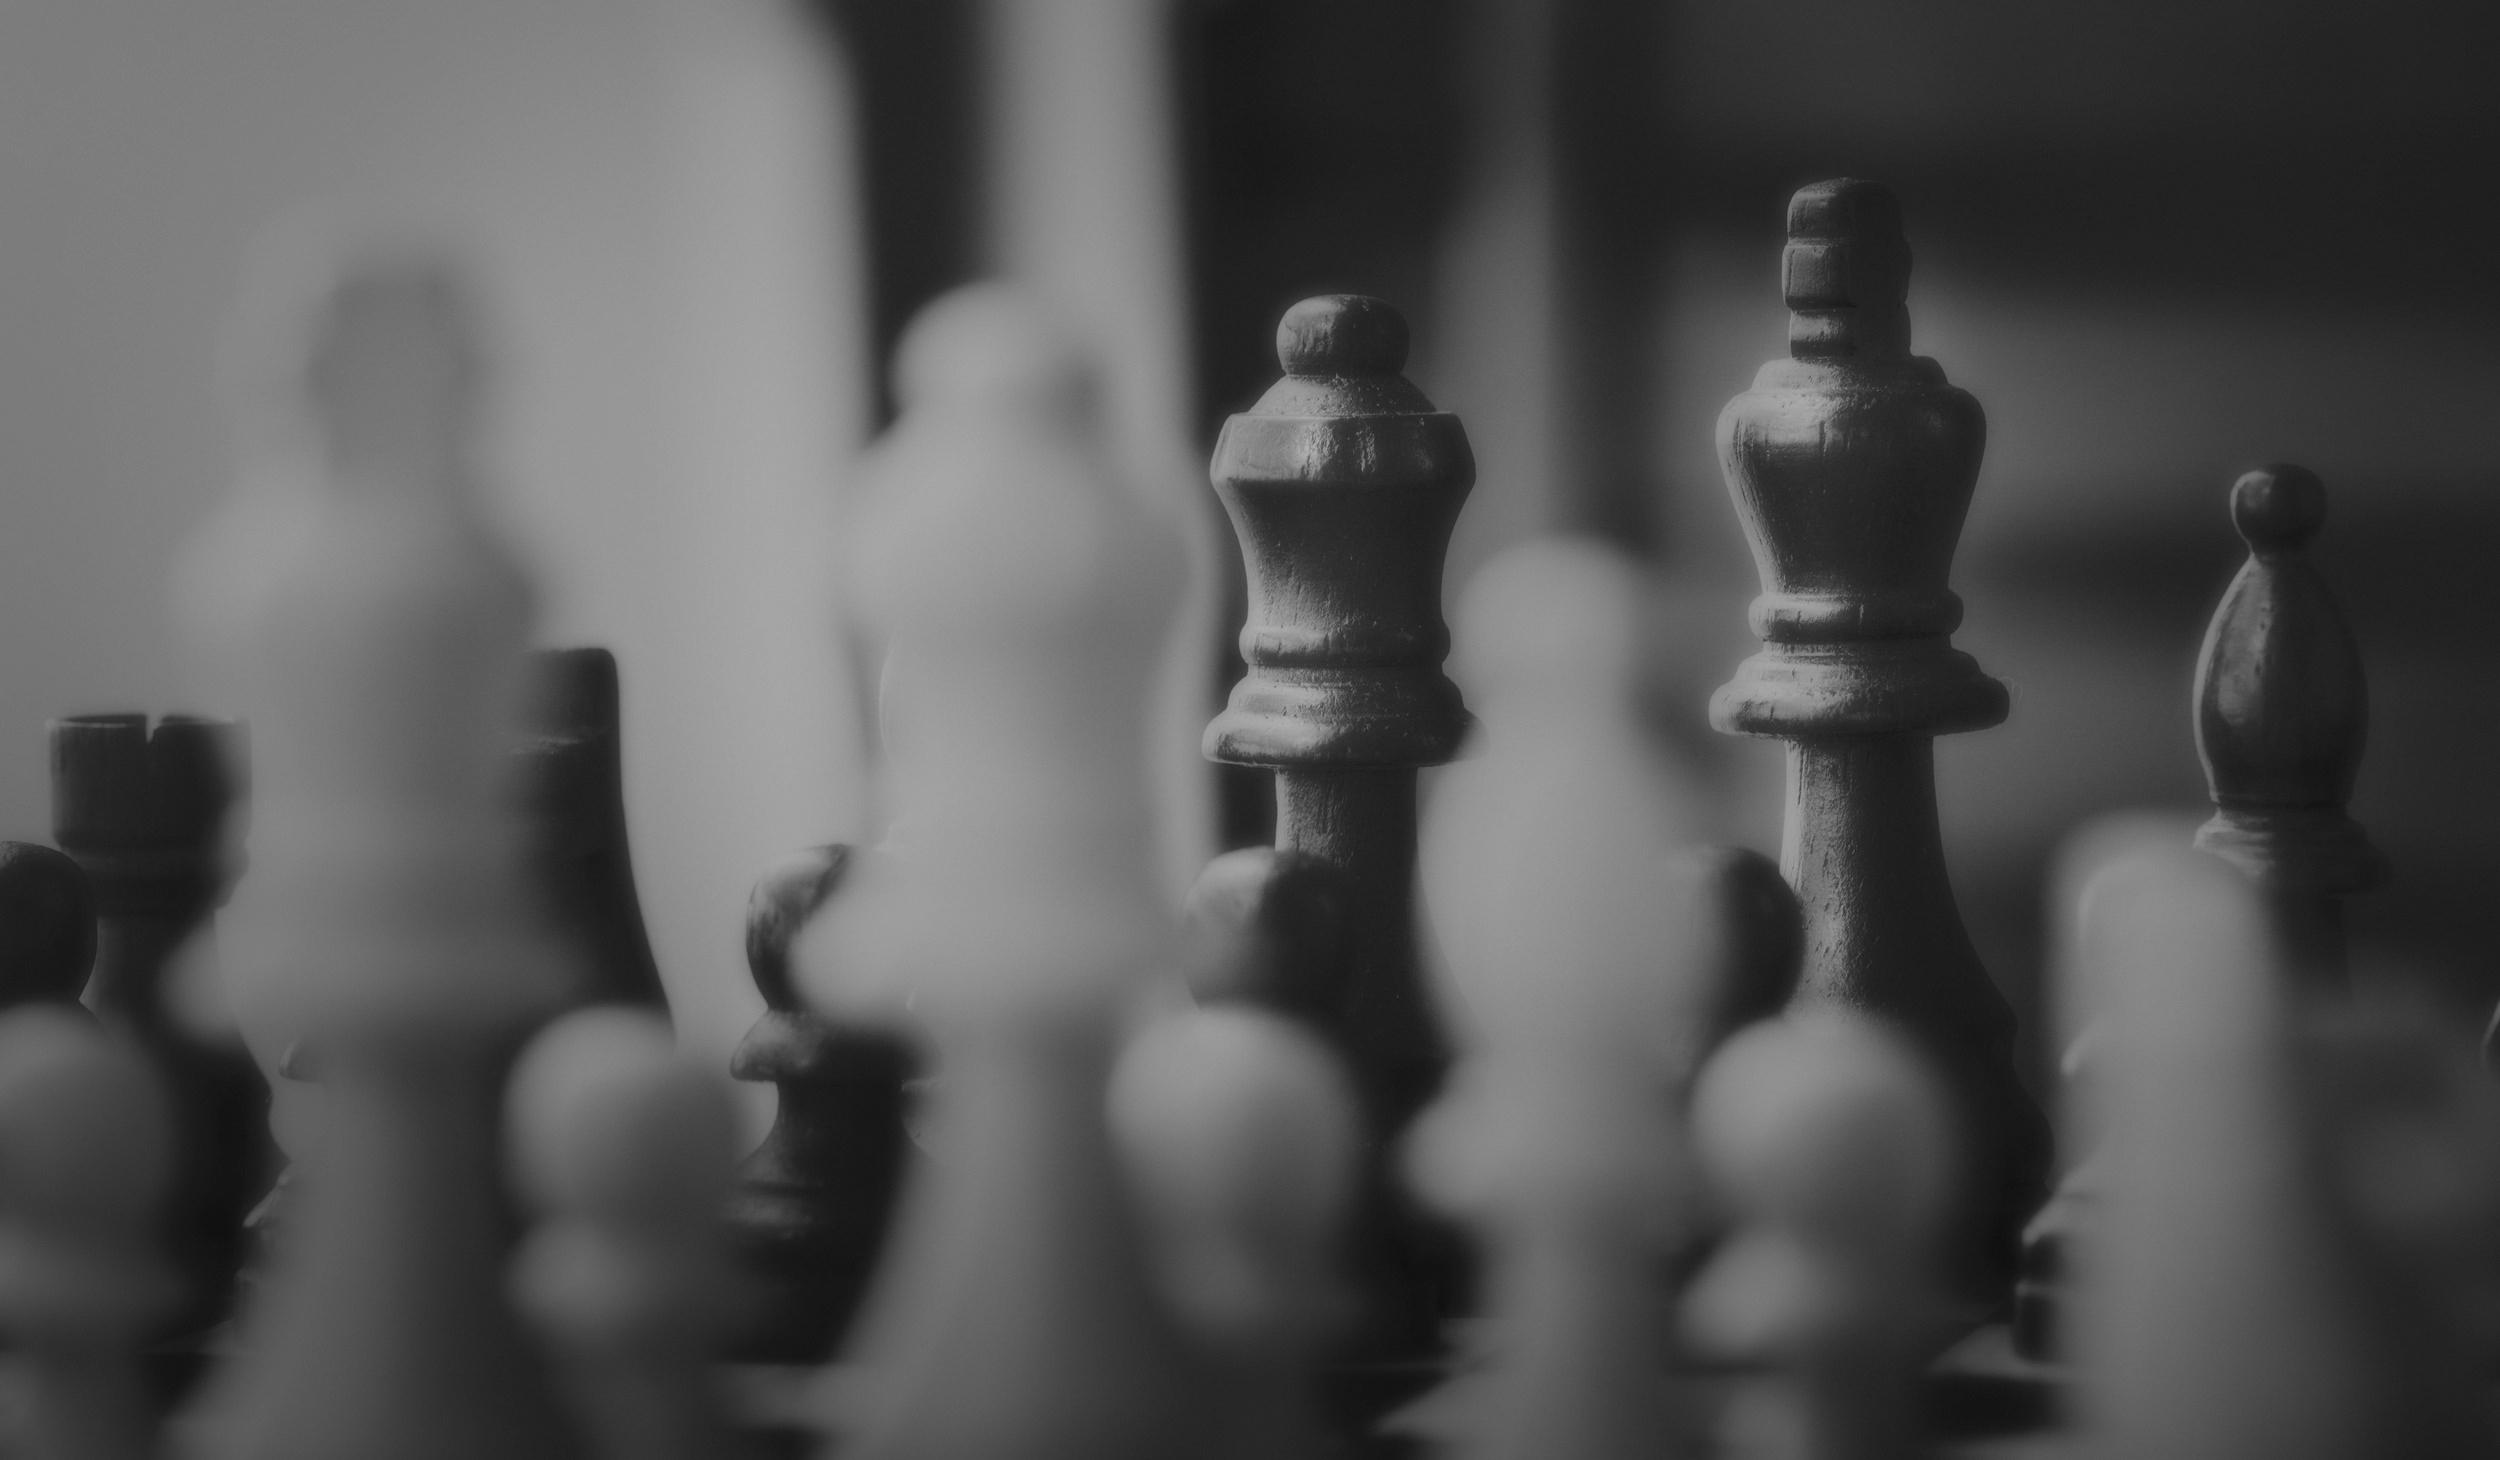 black-and-white-black-and-white-board-game-875515.jpg